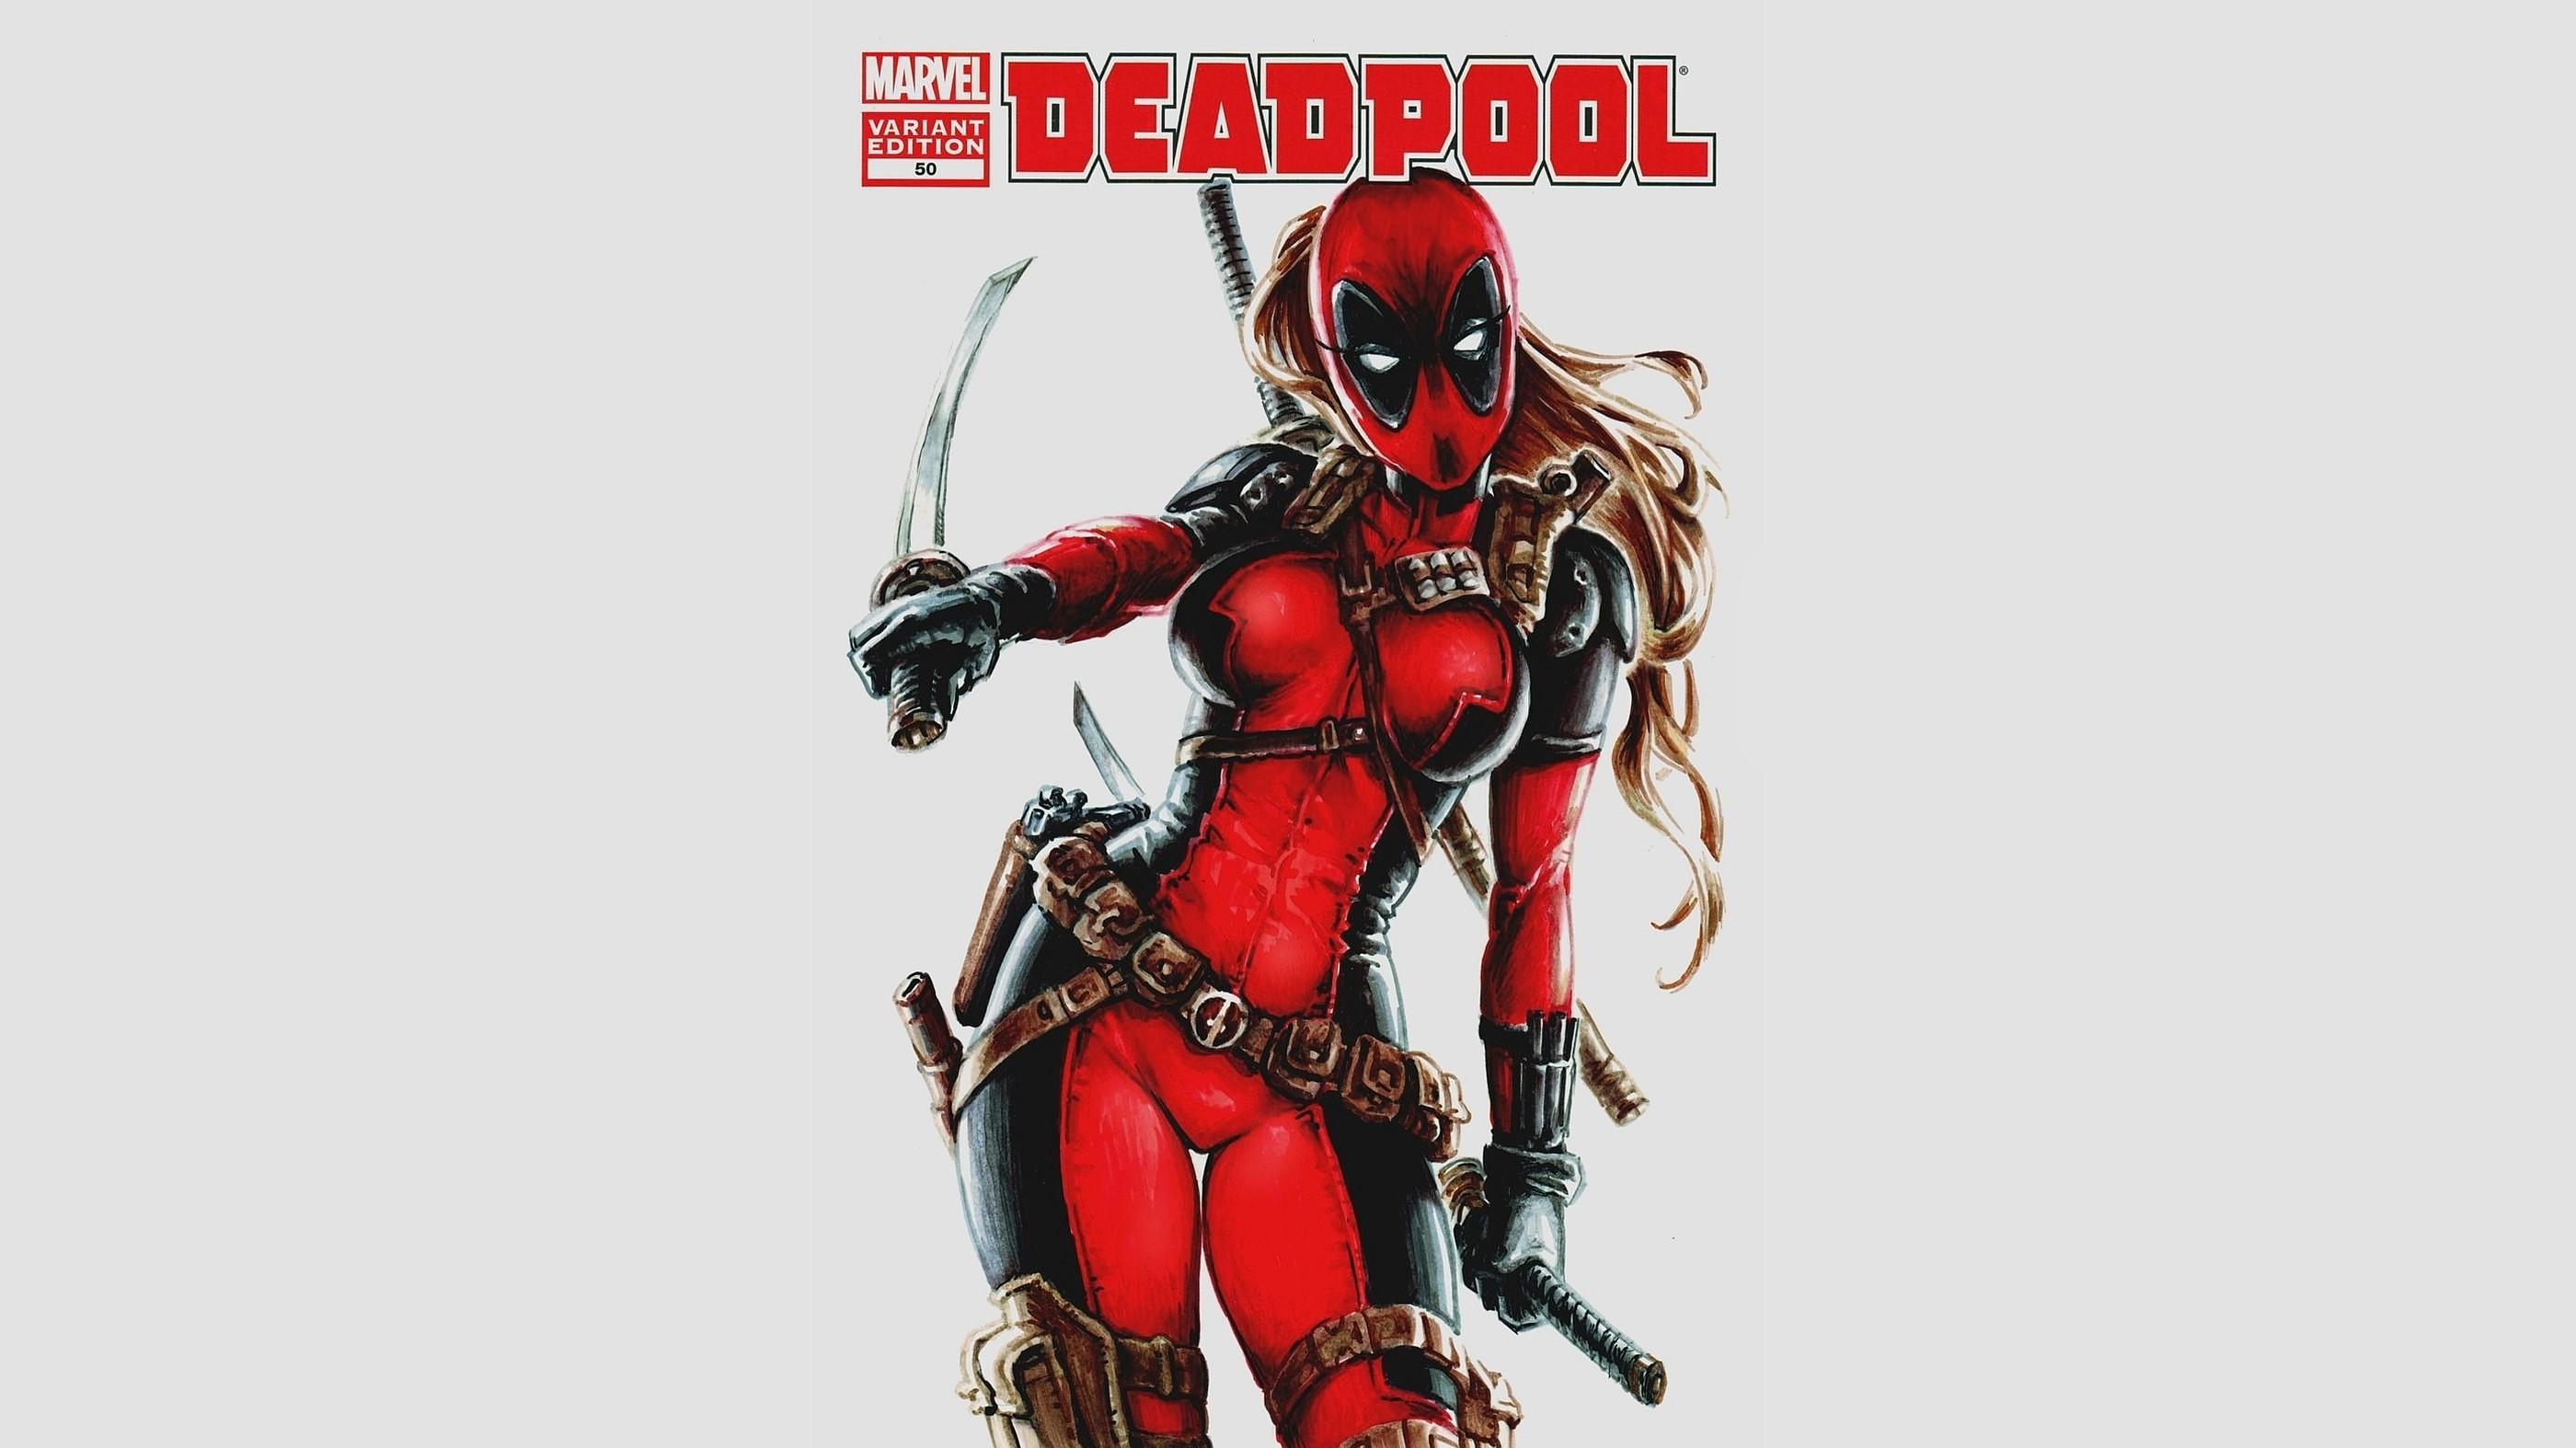 Deadpool Cool Girl Wallpaper HD.